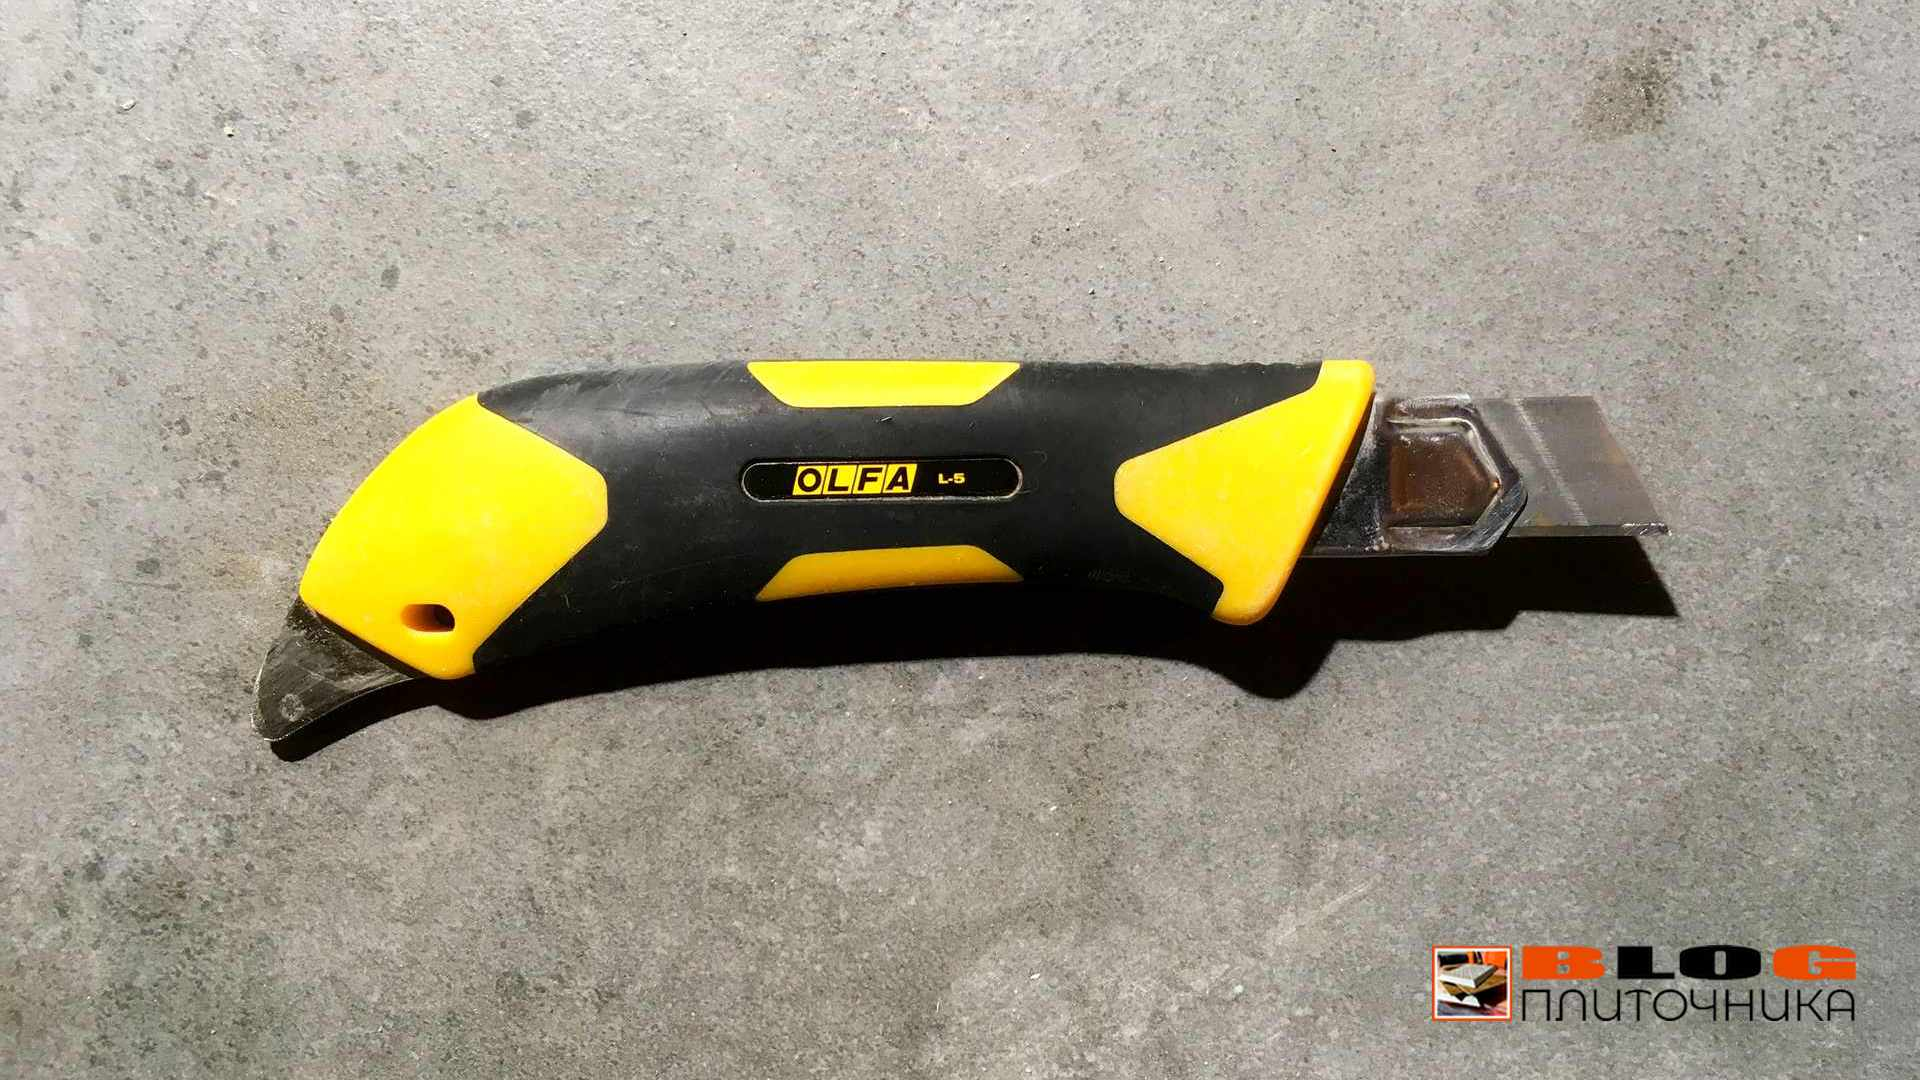 канцелярский нож плиточника стандартный блог плиточника